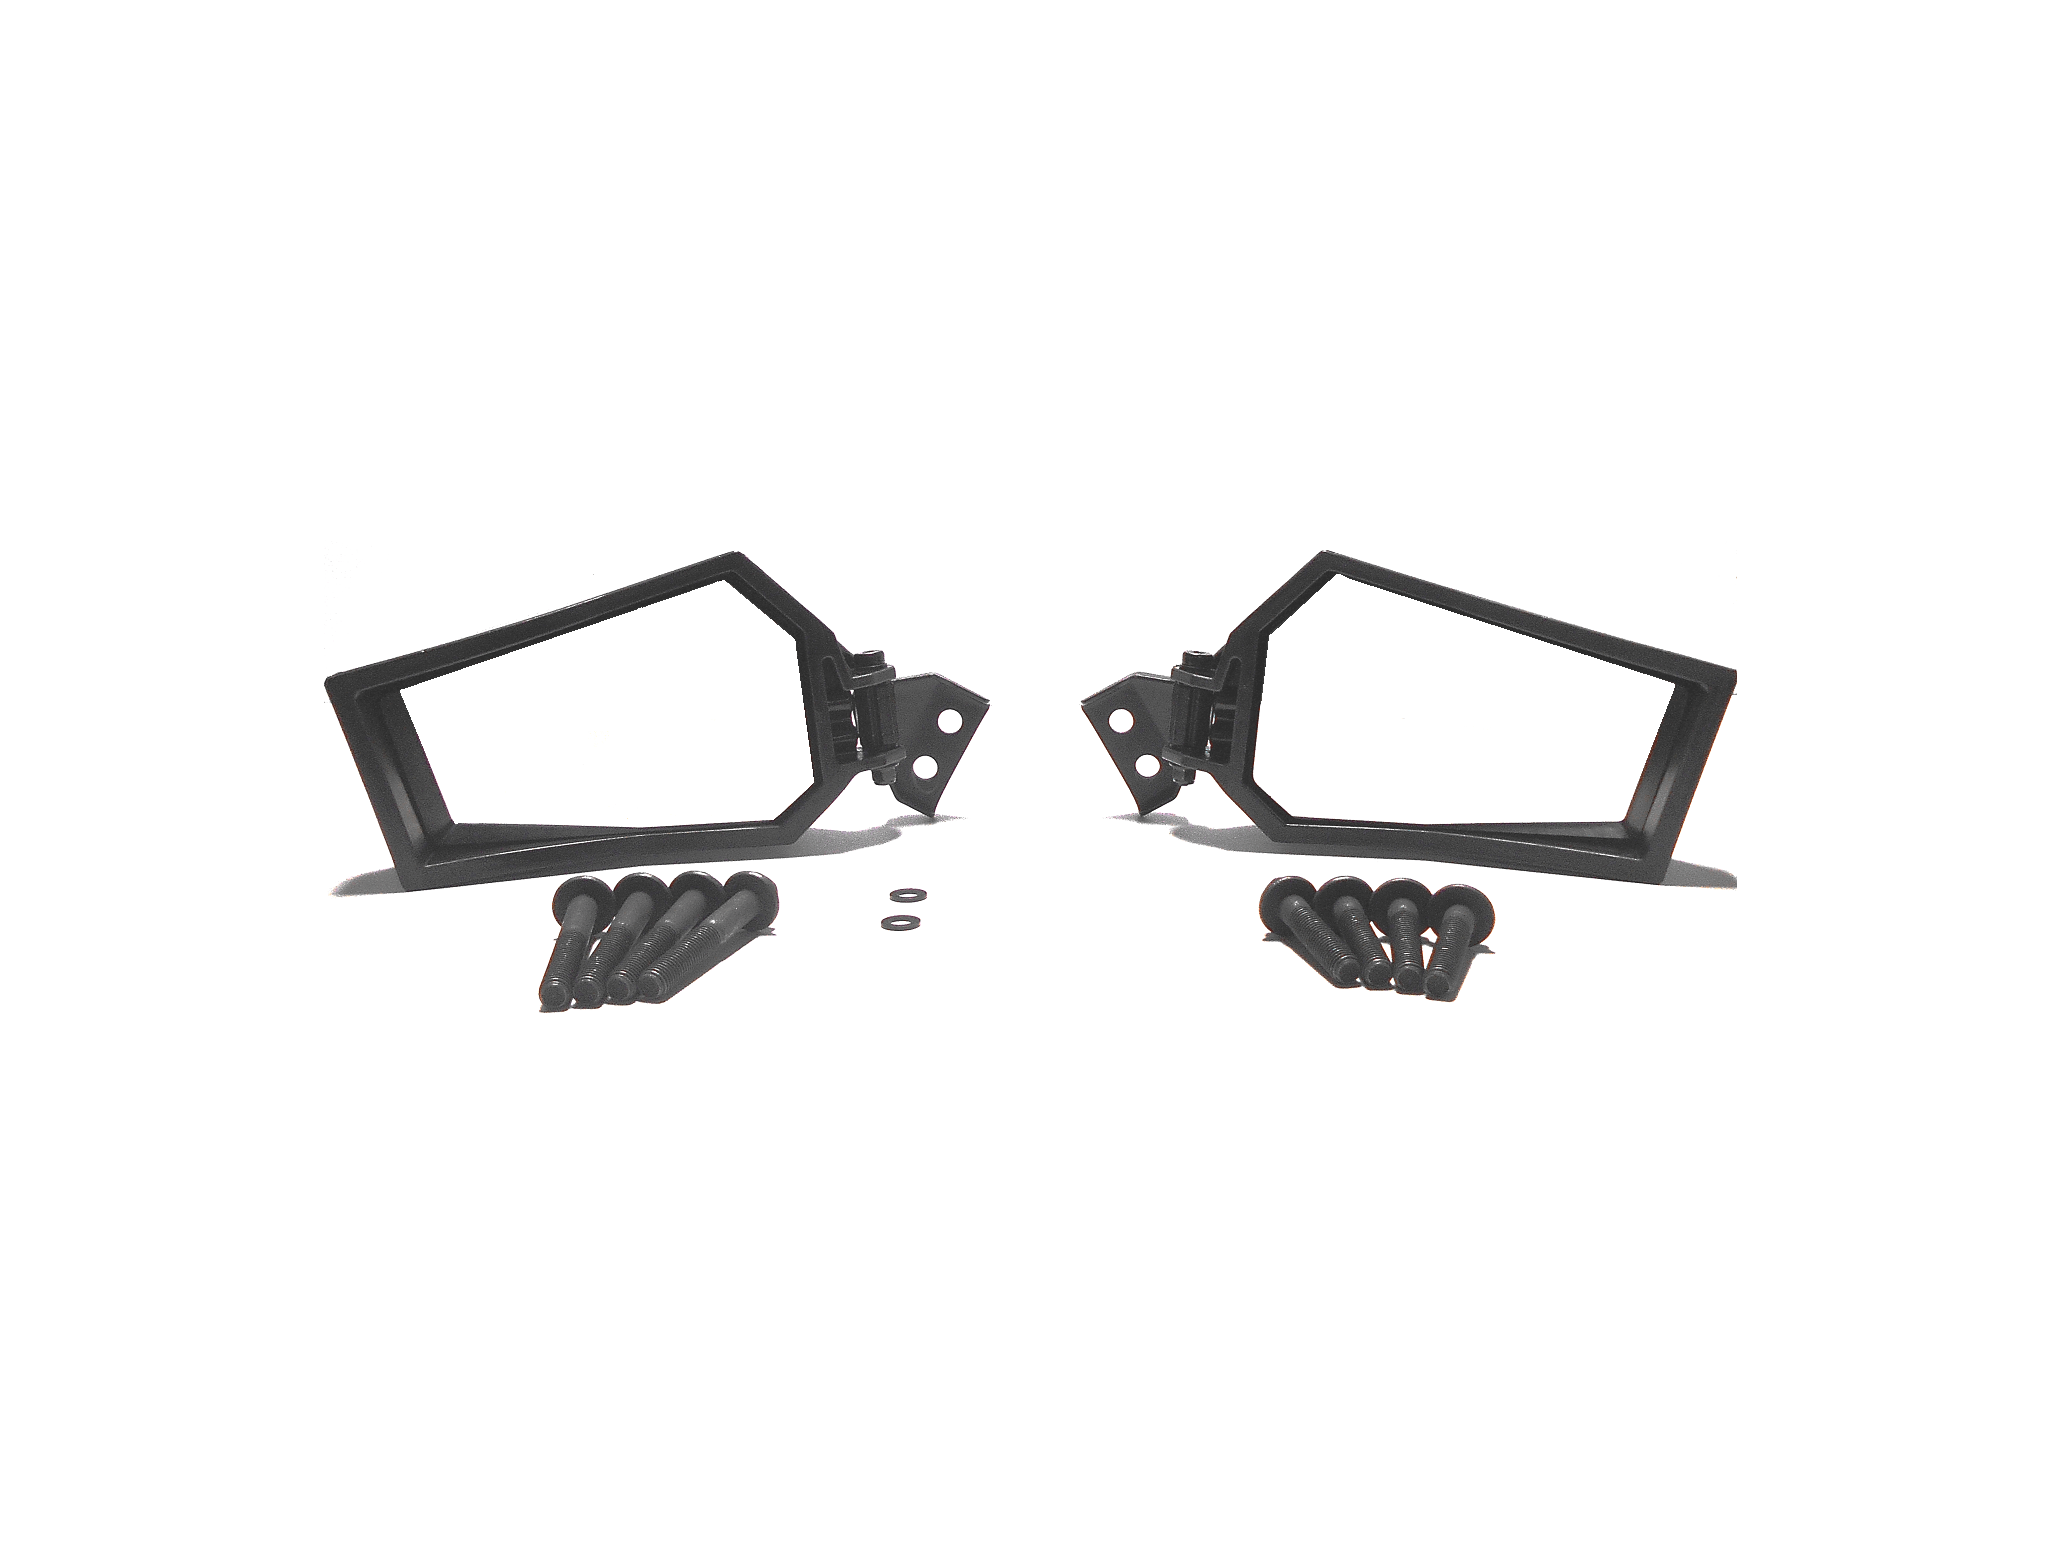 Polaris Rzr Xp 4 900 Oem Breakaway Folding